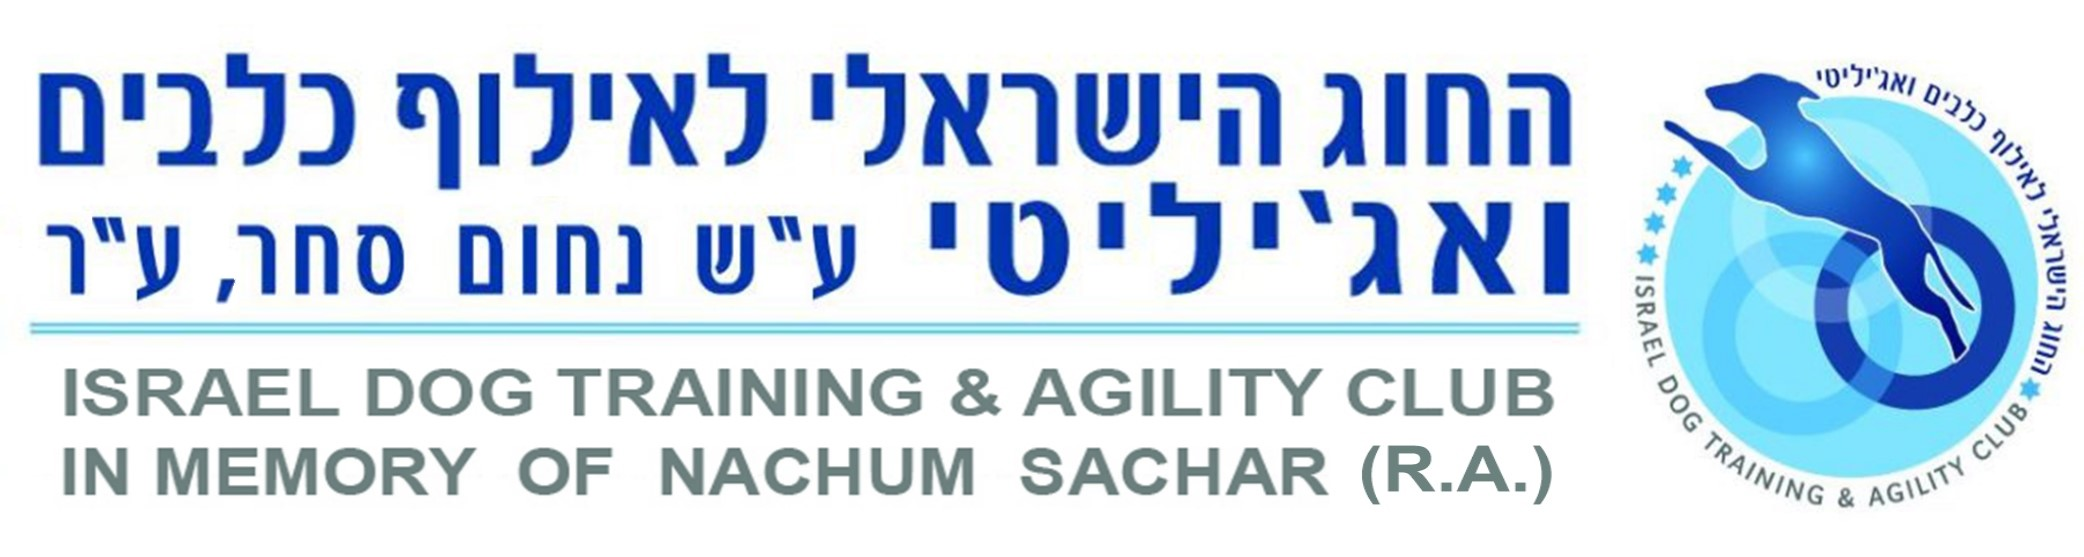 www.agility.co.il